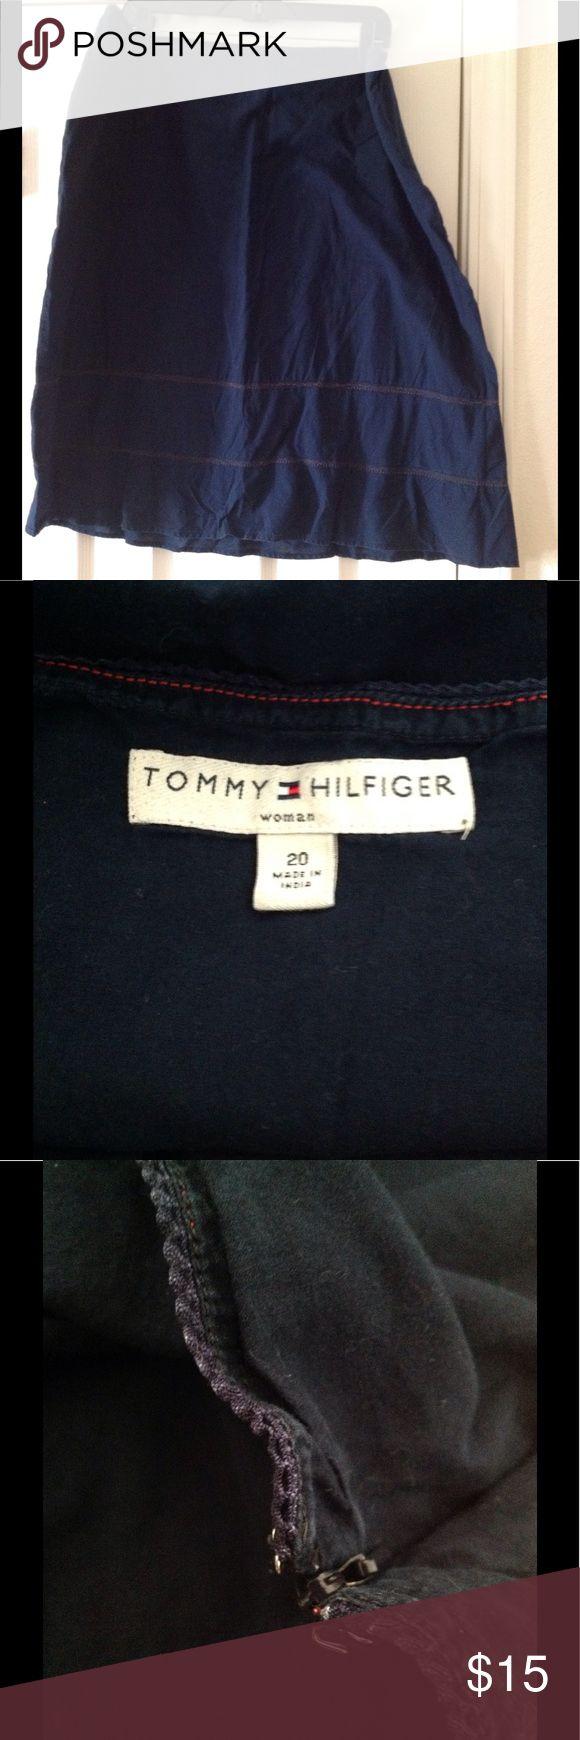 TOMMY HILFIGER NAVY BLUE SIZE 20 BOHO SKIRT BOHO/COTTON SKIRT NAVY BLUE BY TOMMY HILFIGER SIZE 20 Tommy Hilfiger Skirts Midi